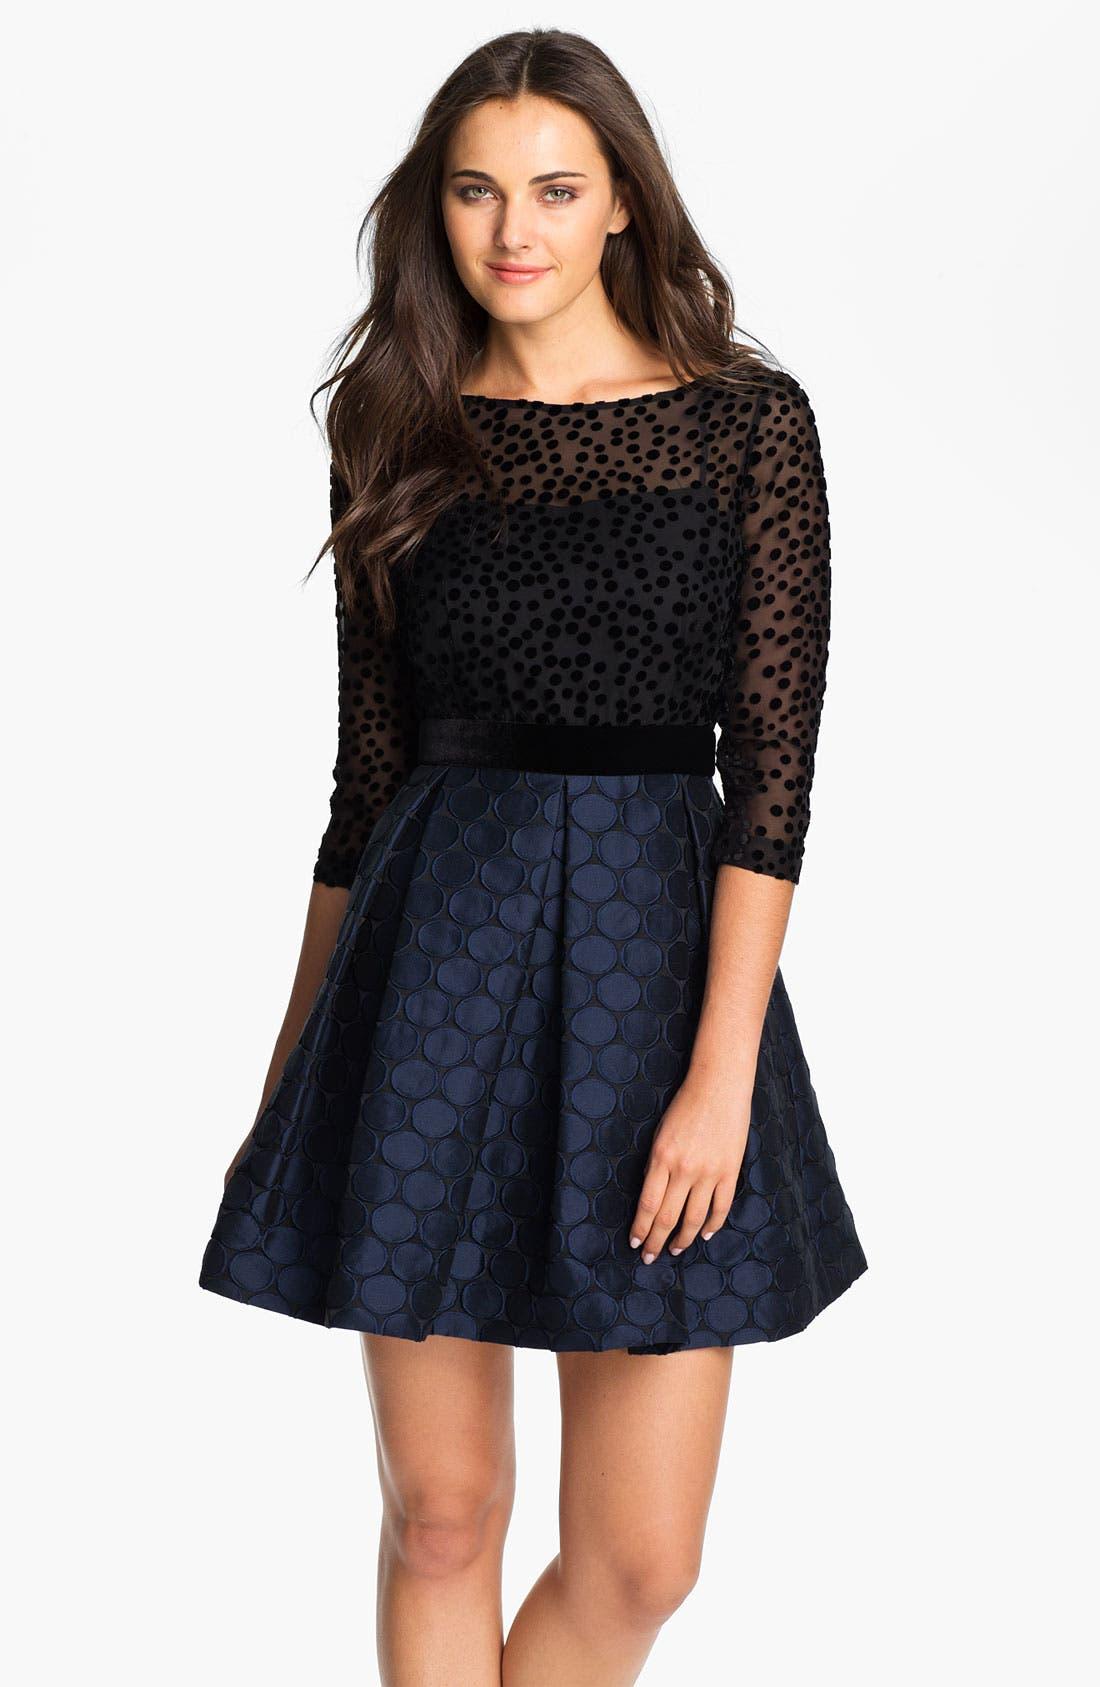 Alternate Image 1 Selected - Taylor Dresses Burnout Bodice Jacquard Fit & Flare Dress